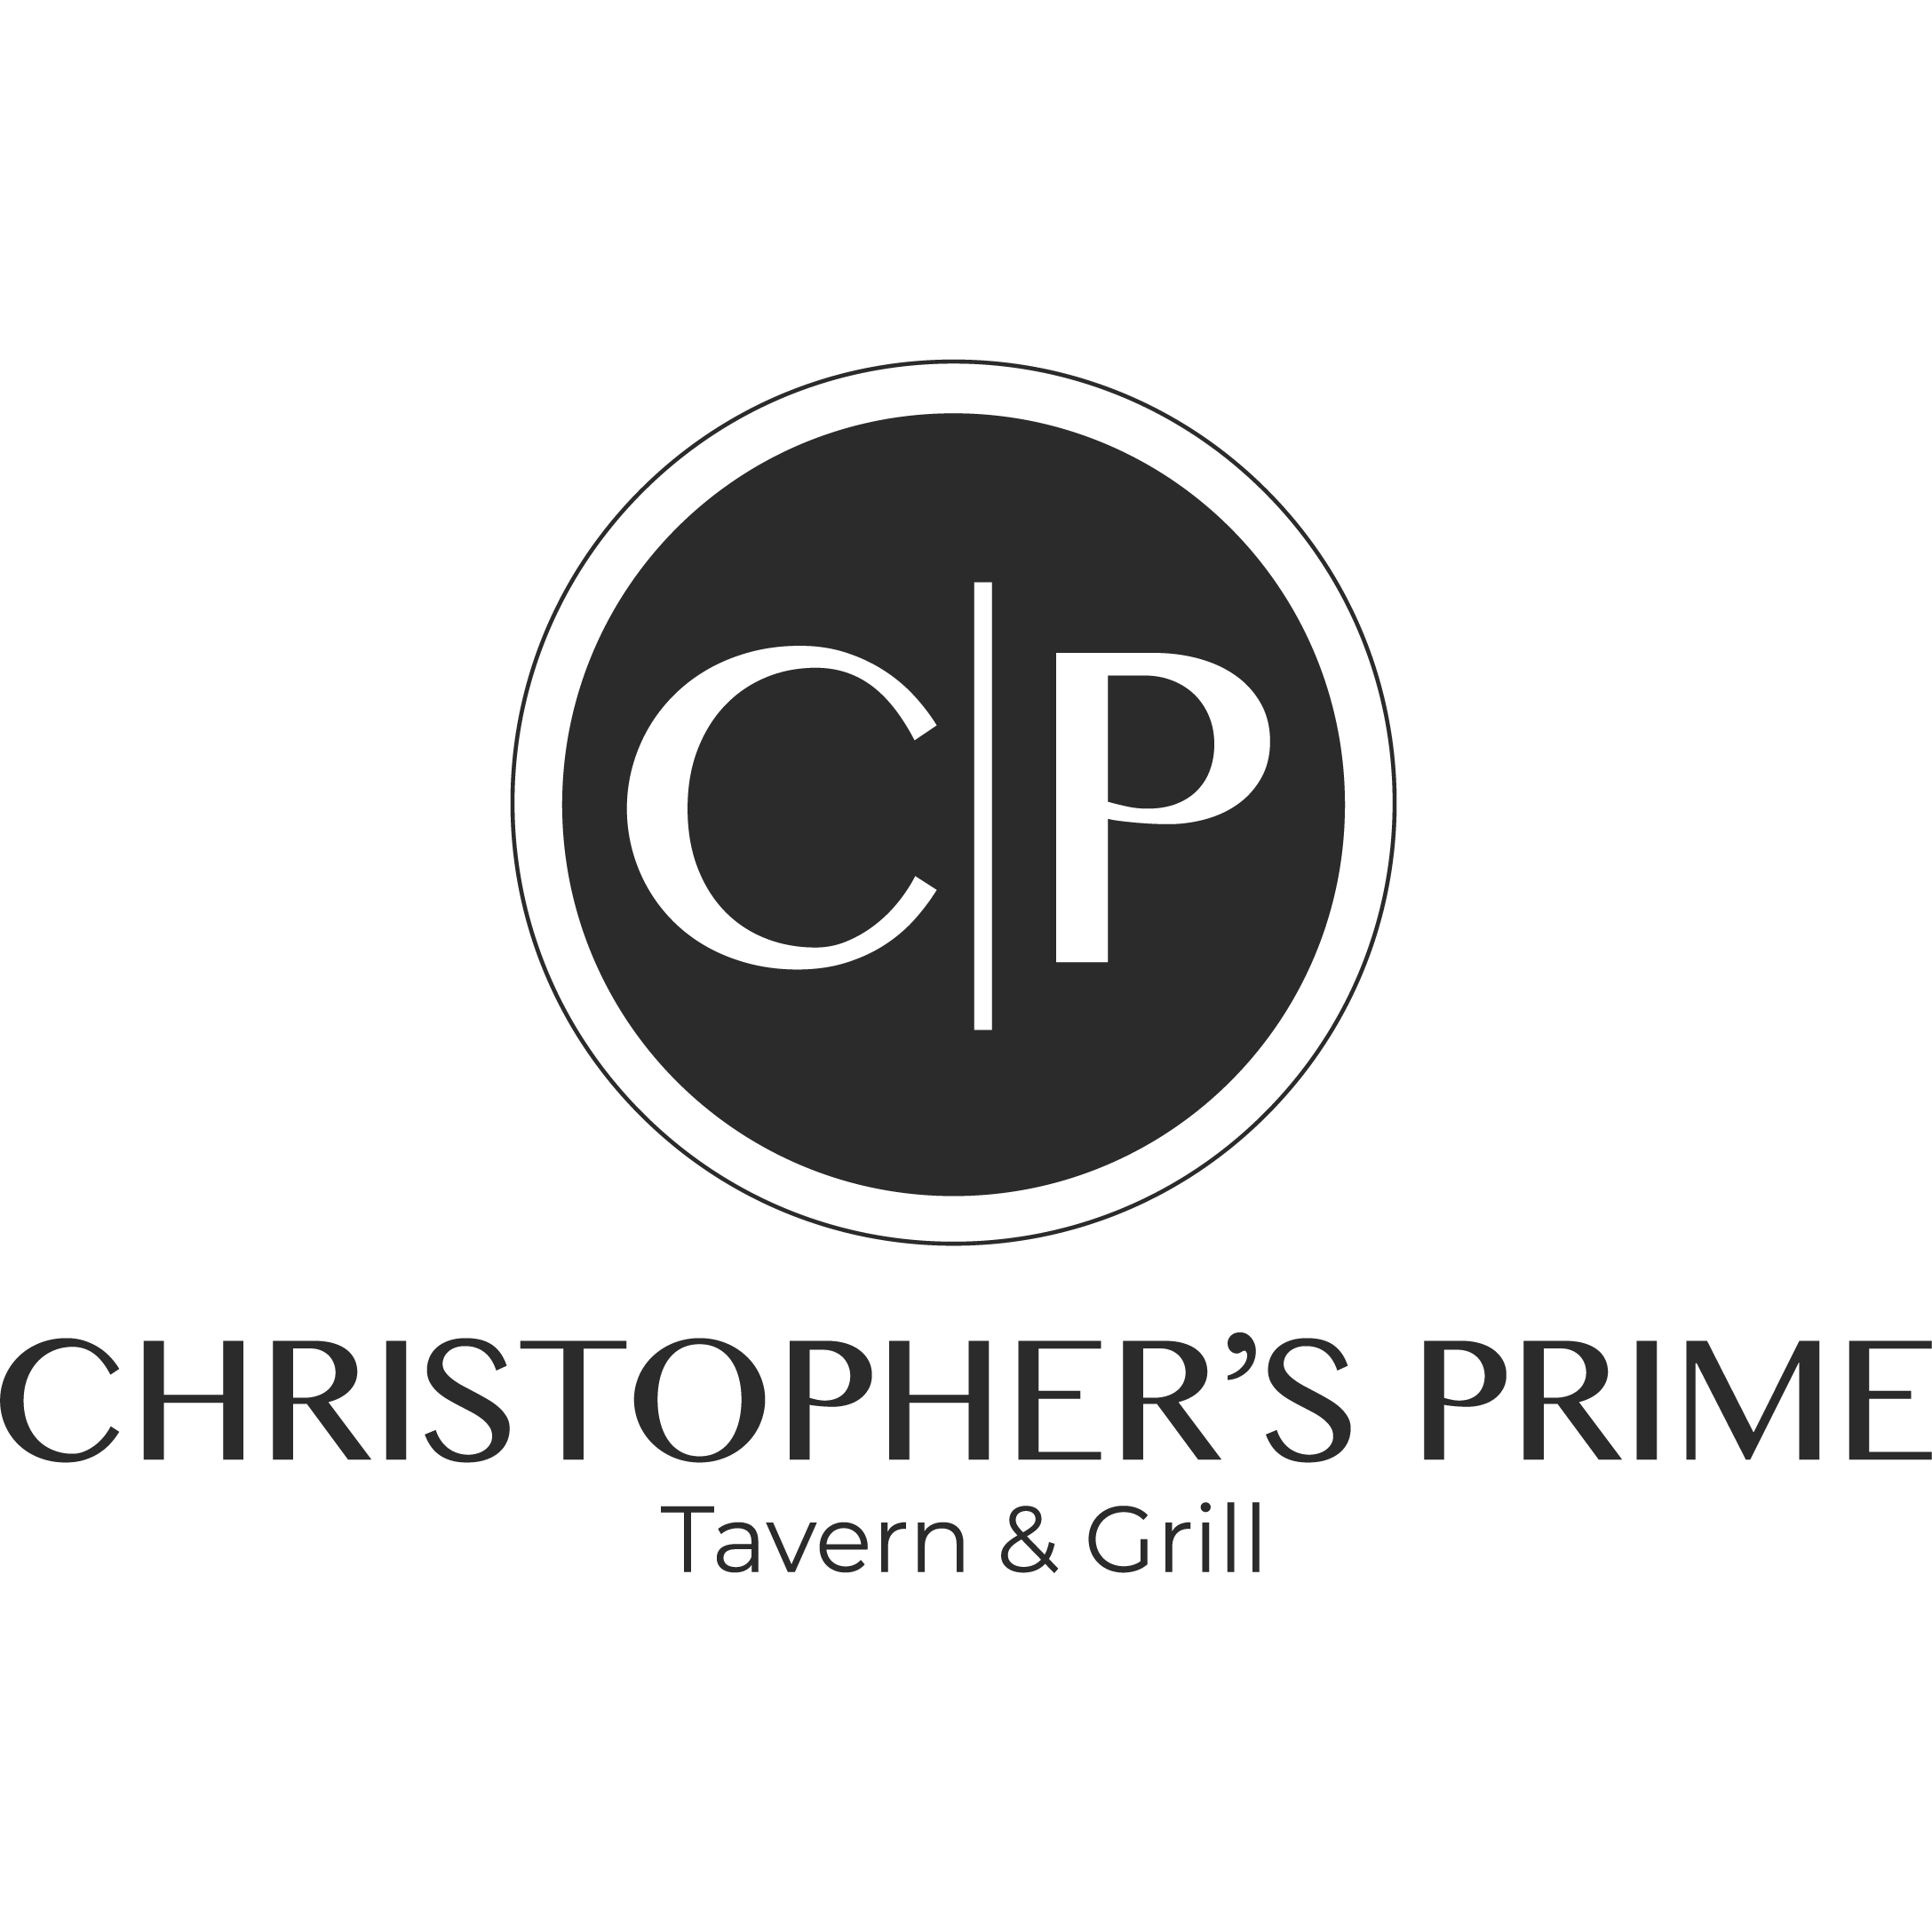 Christopher's Prime Tavern & Grill